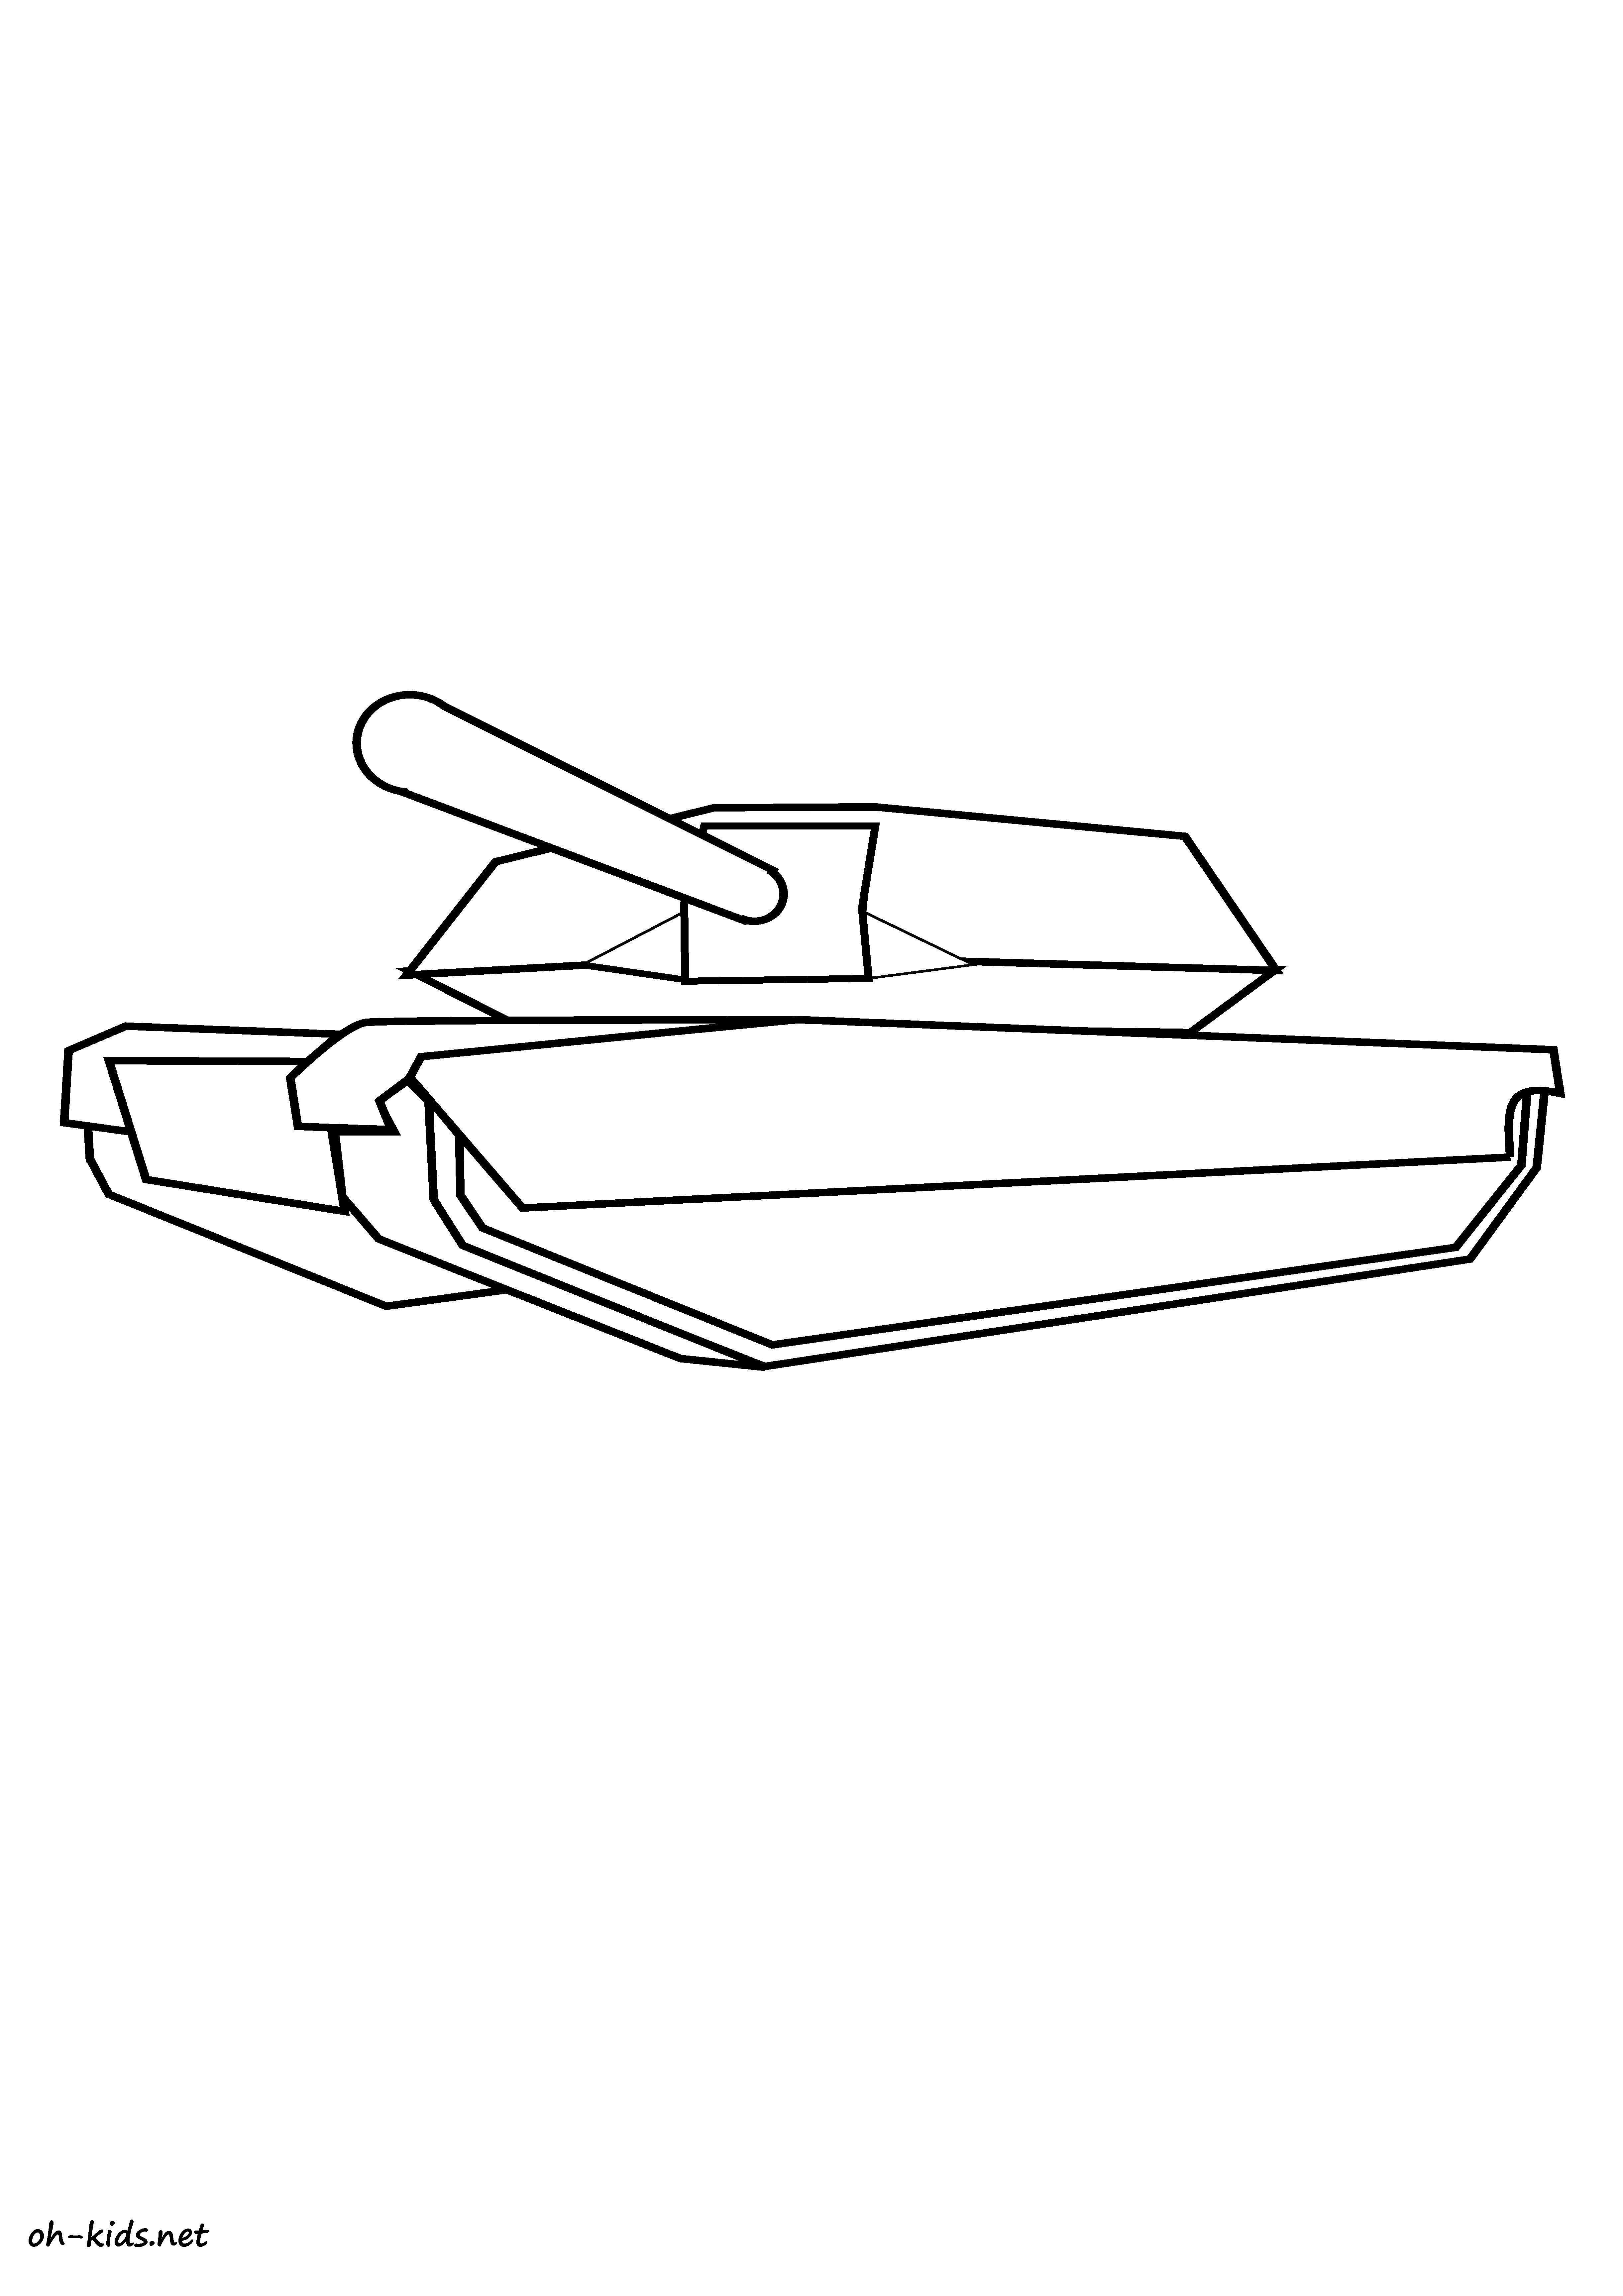 Dessin 303 coloriage tank imprimer oh - Coloriage de tank ...